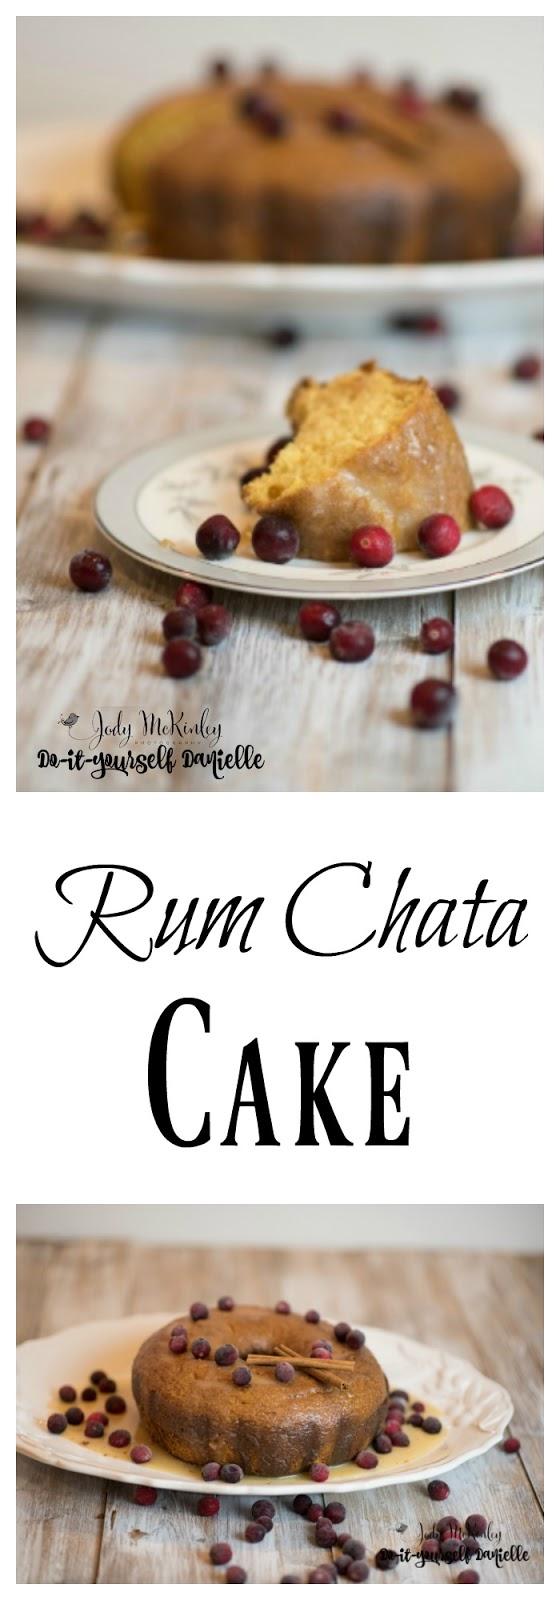 How to make Rum Chata Cake.